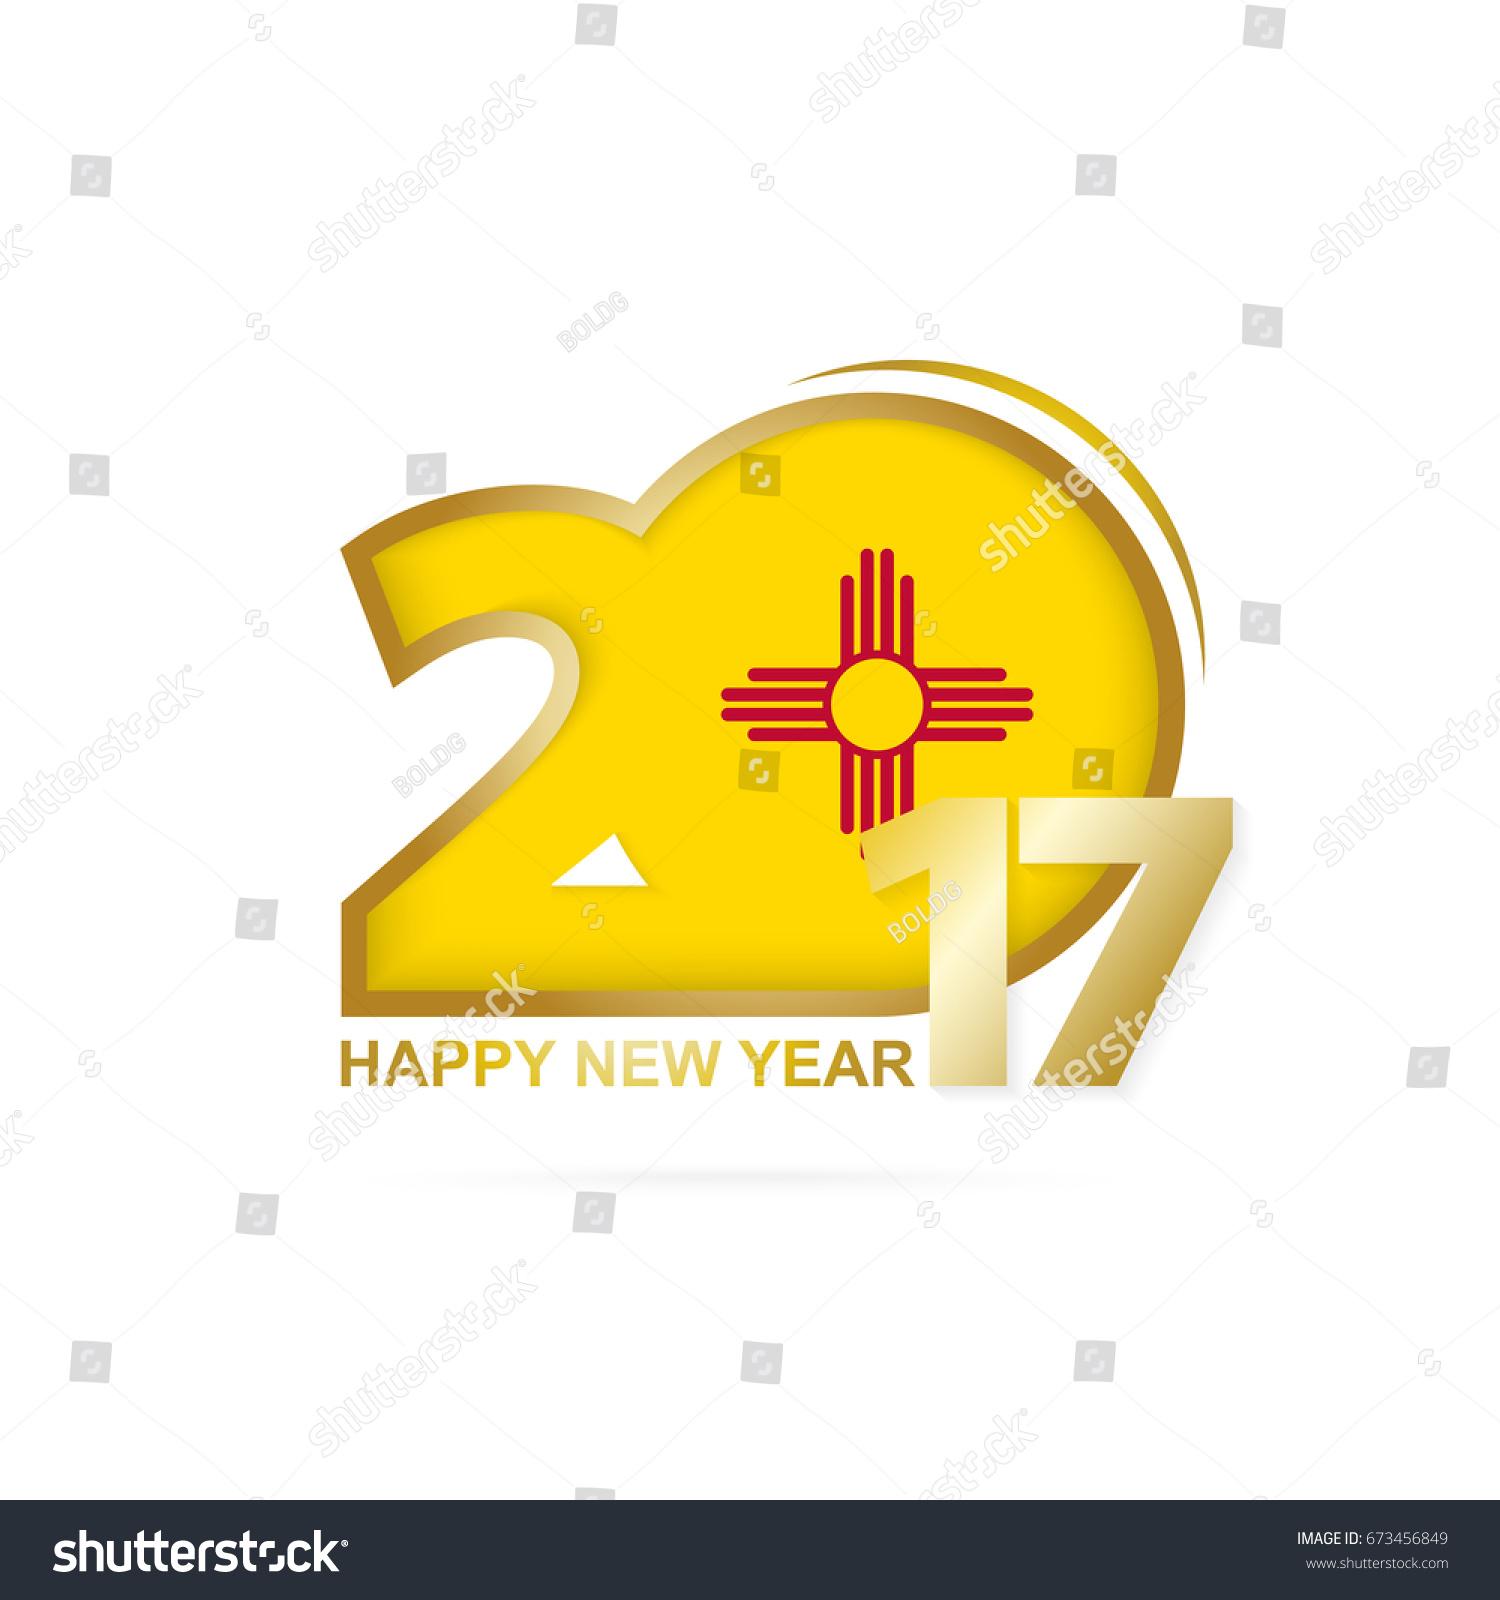 Year 2017 new mexico state flag stock illustration 673456849 year 2017 with new mexico state flag pattern happy new year design on white background buycottarizona